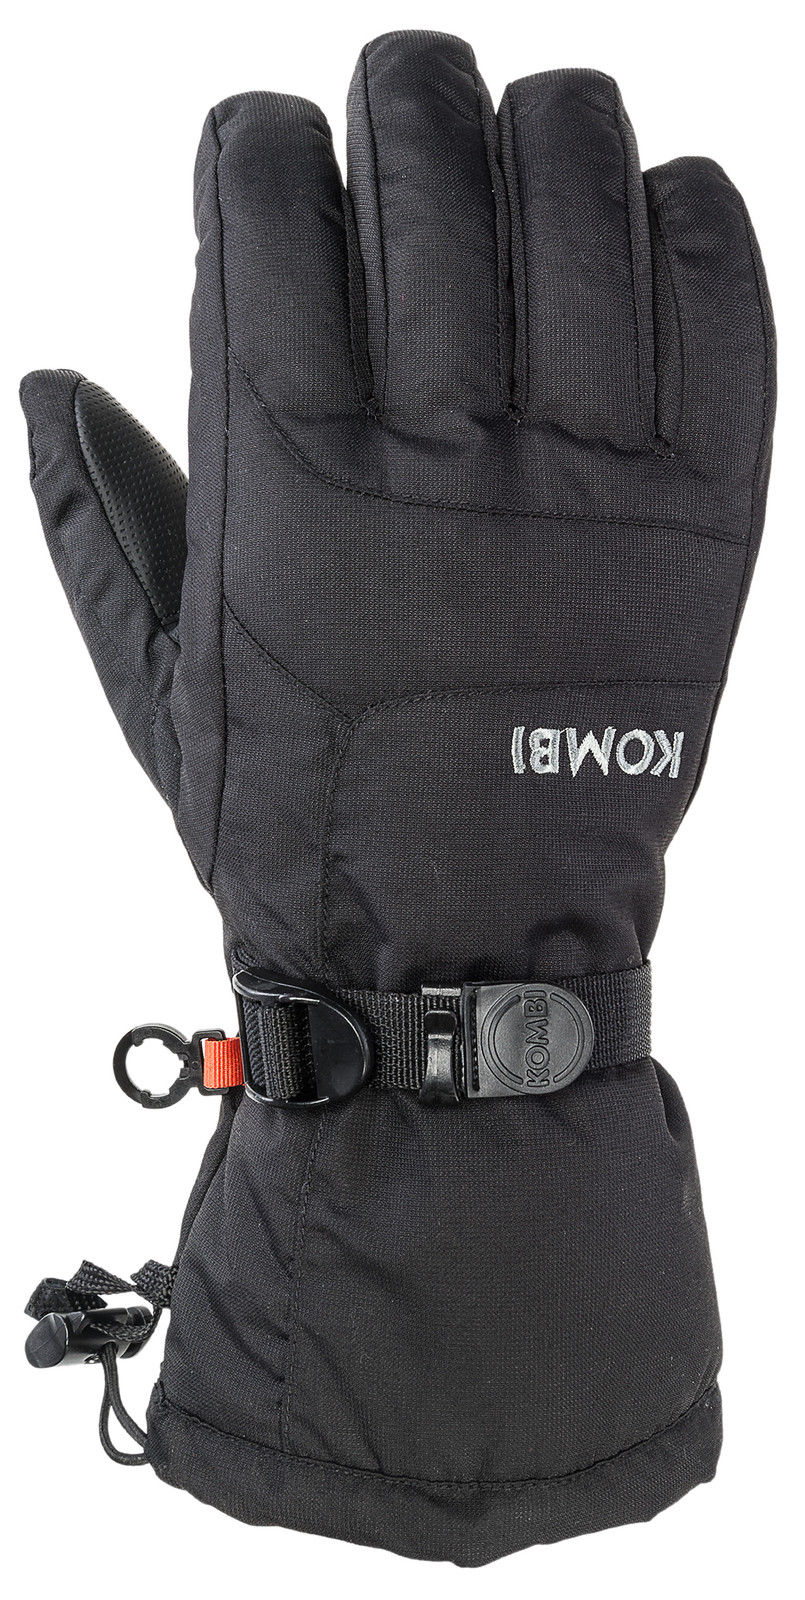 Mens ski gloves xl - Kombi The Efficient Mens Ski Glove Waterproof Gore